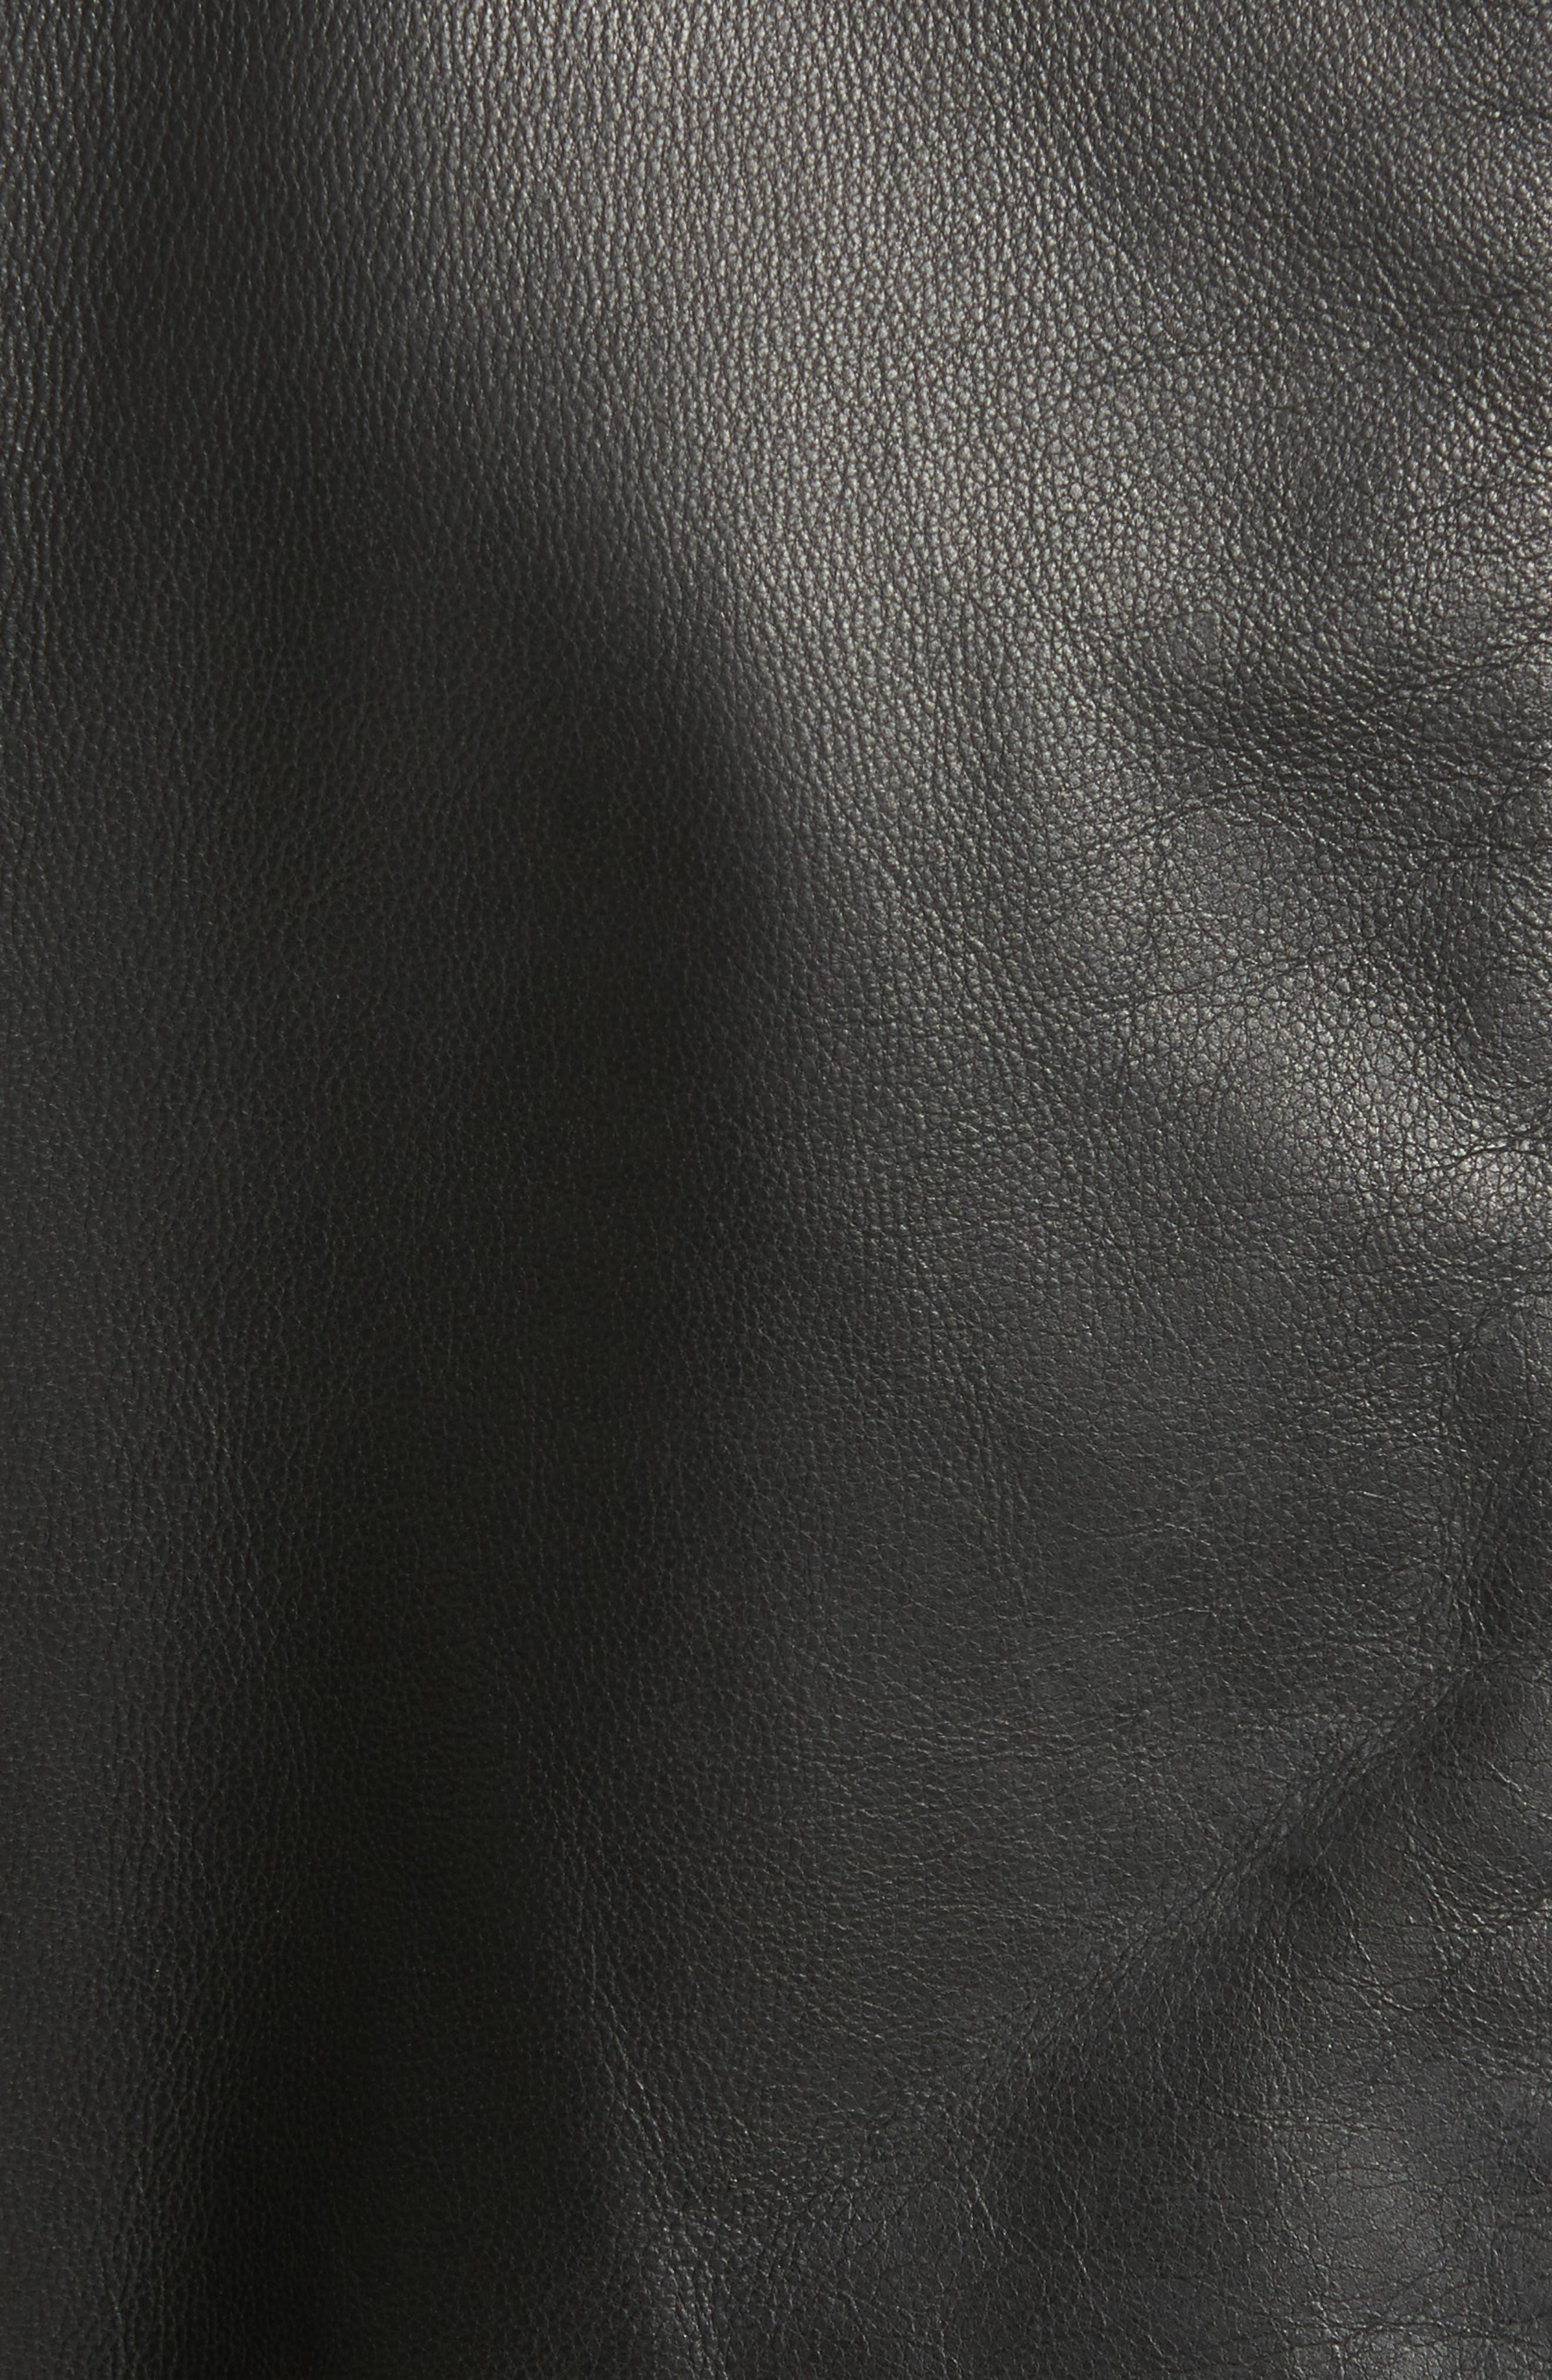 Carrack Leather Jacket,                             Alternate thumbnail 6, color,                             001